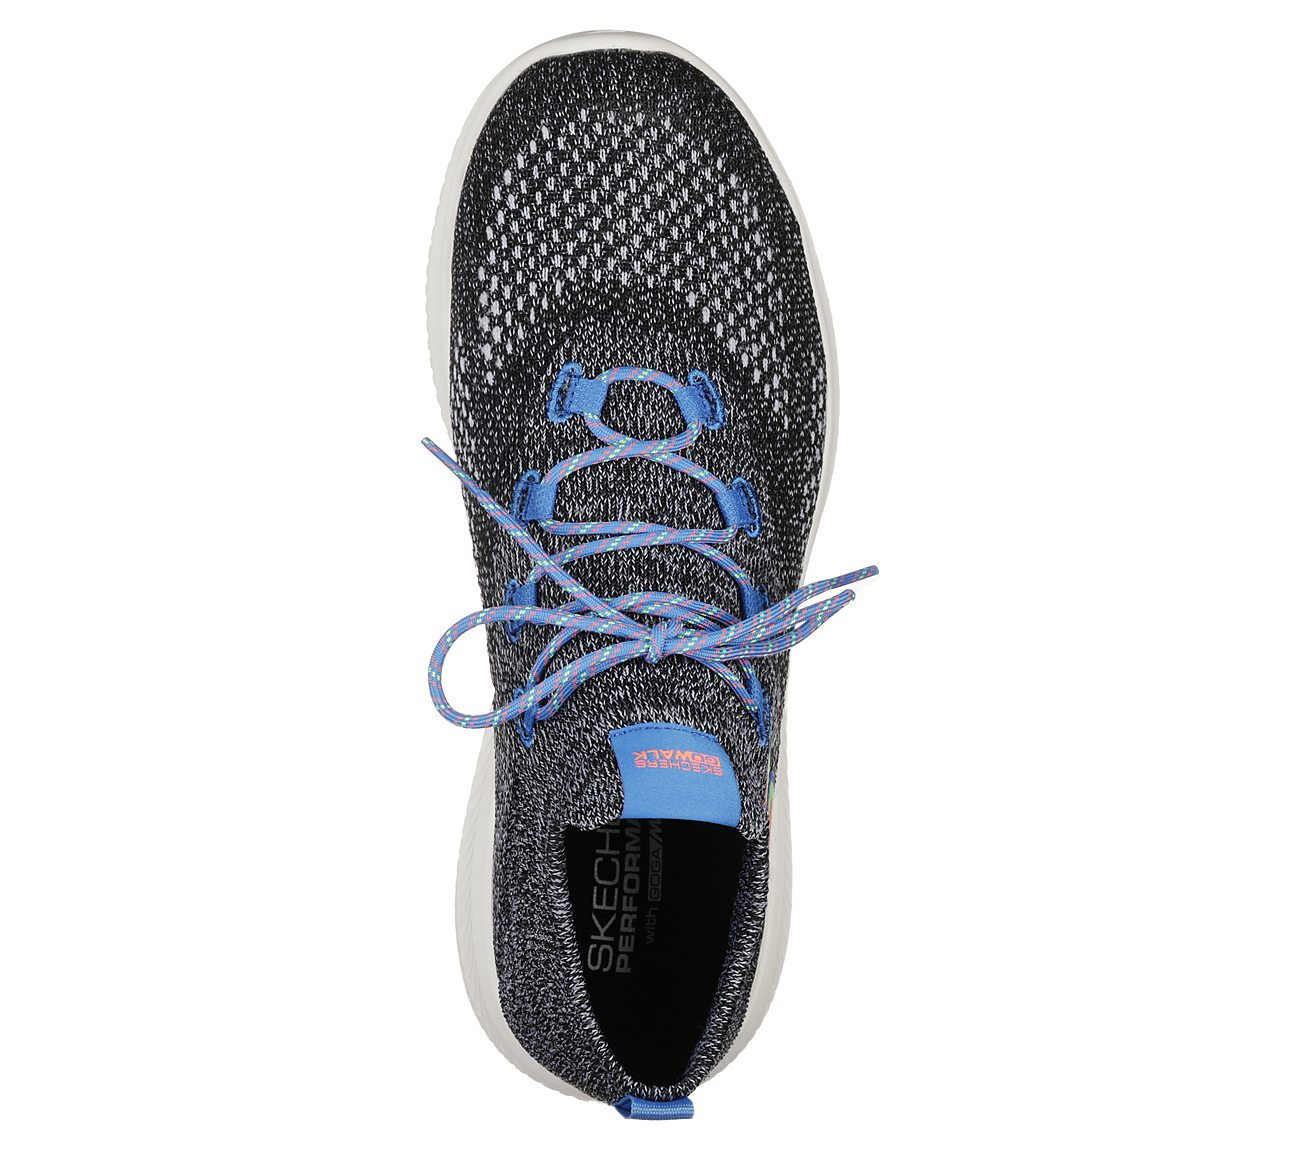 Skechers GO WALK REVOLUT ULTR TURB Black Walking Shoes 54667 BKMT